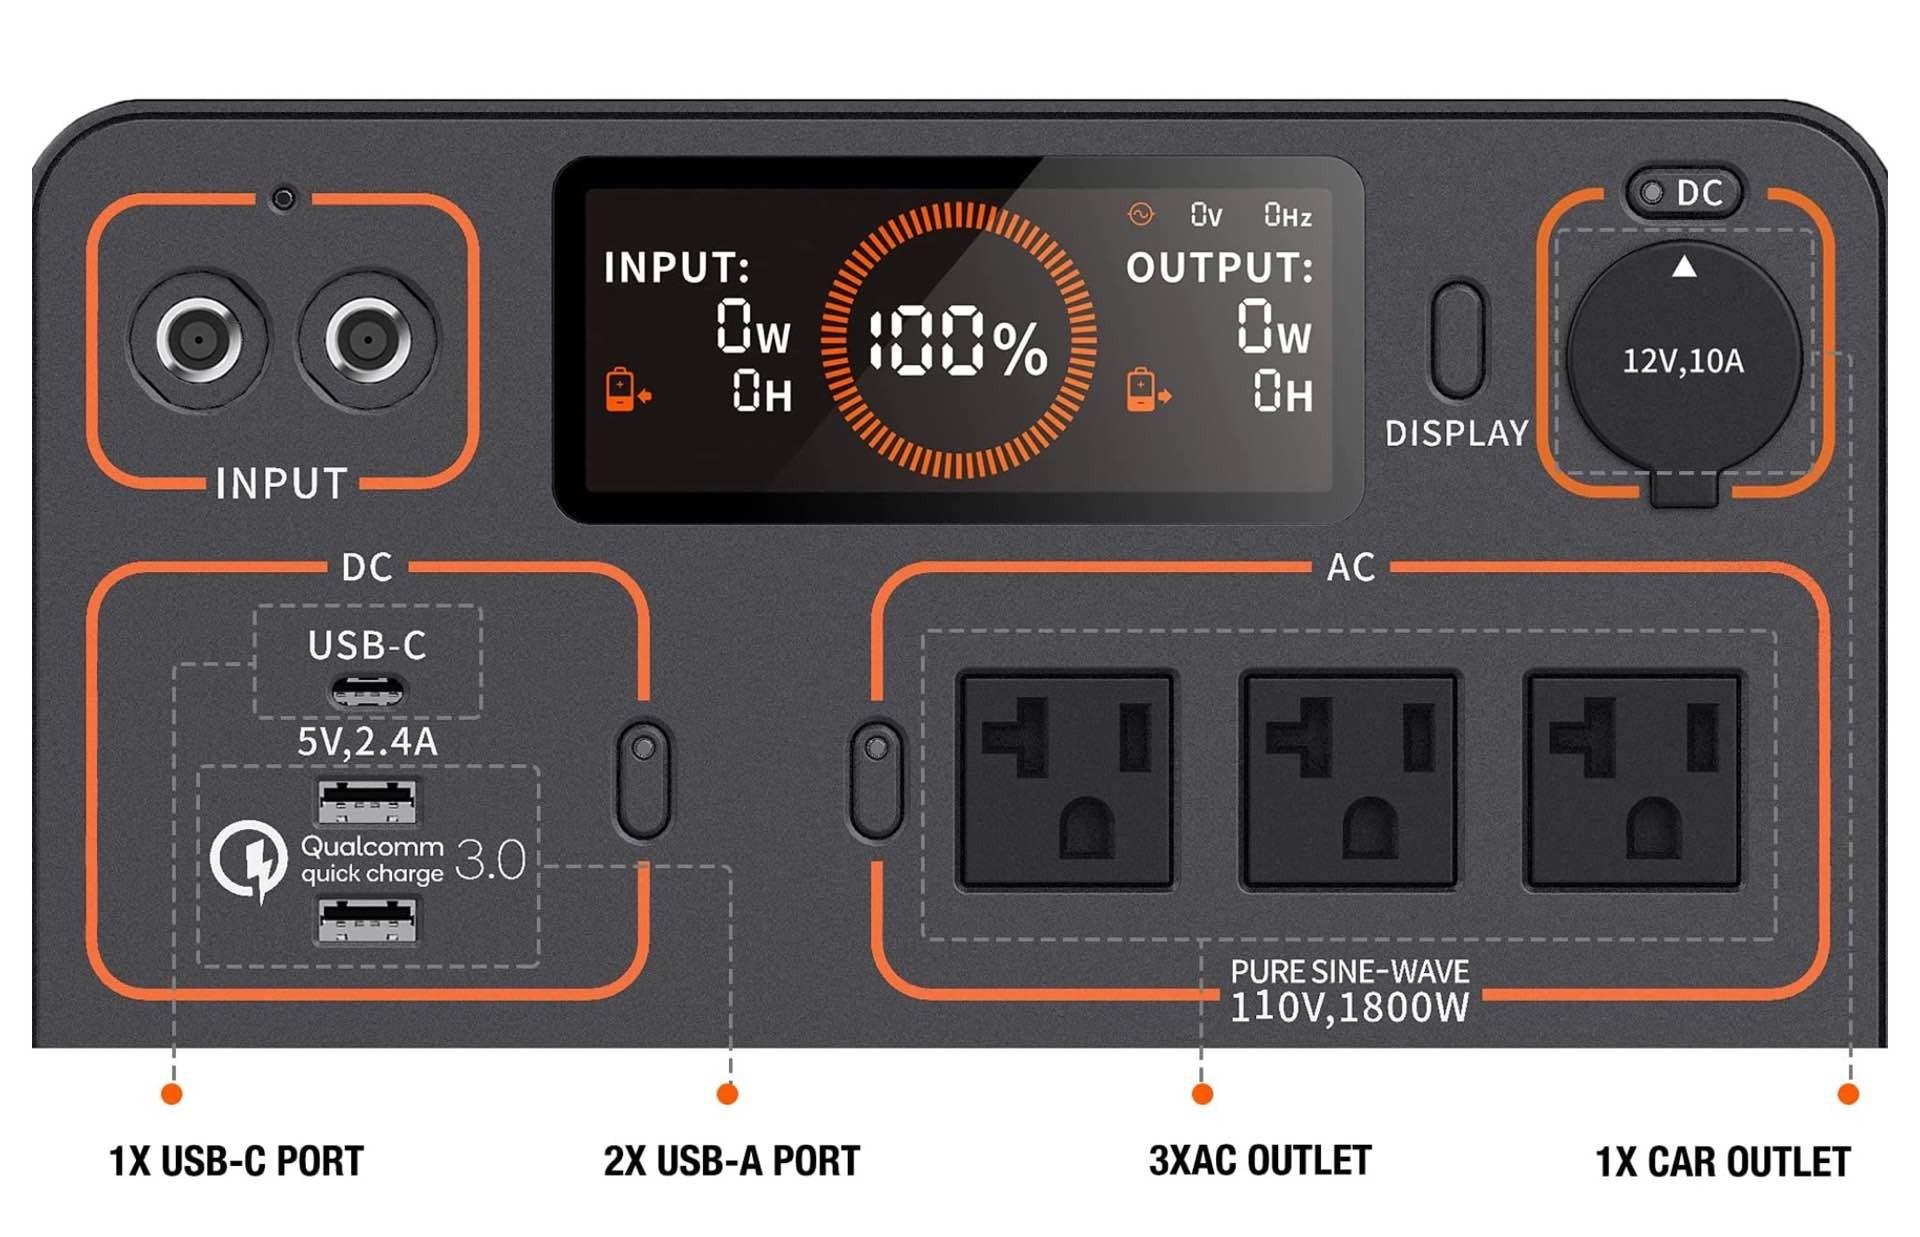 jackery-explorer-1500-portable-power-station-solar-generator-front-panel